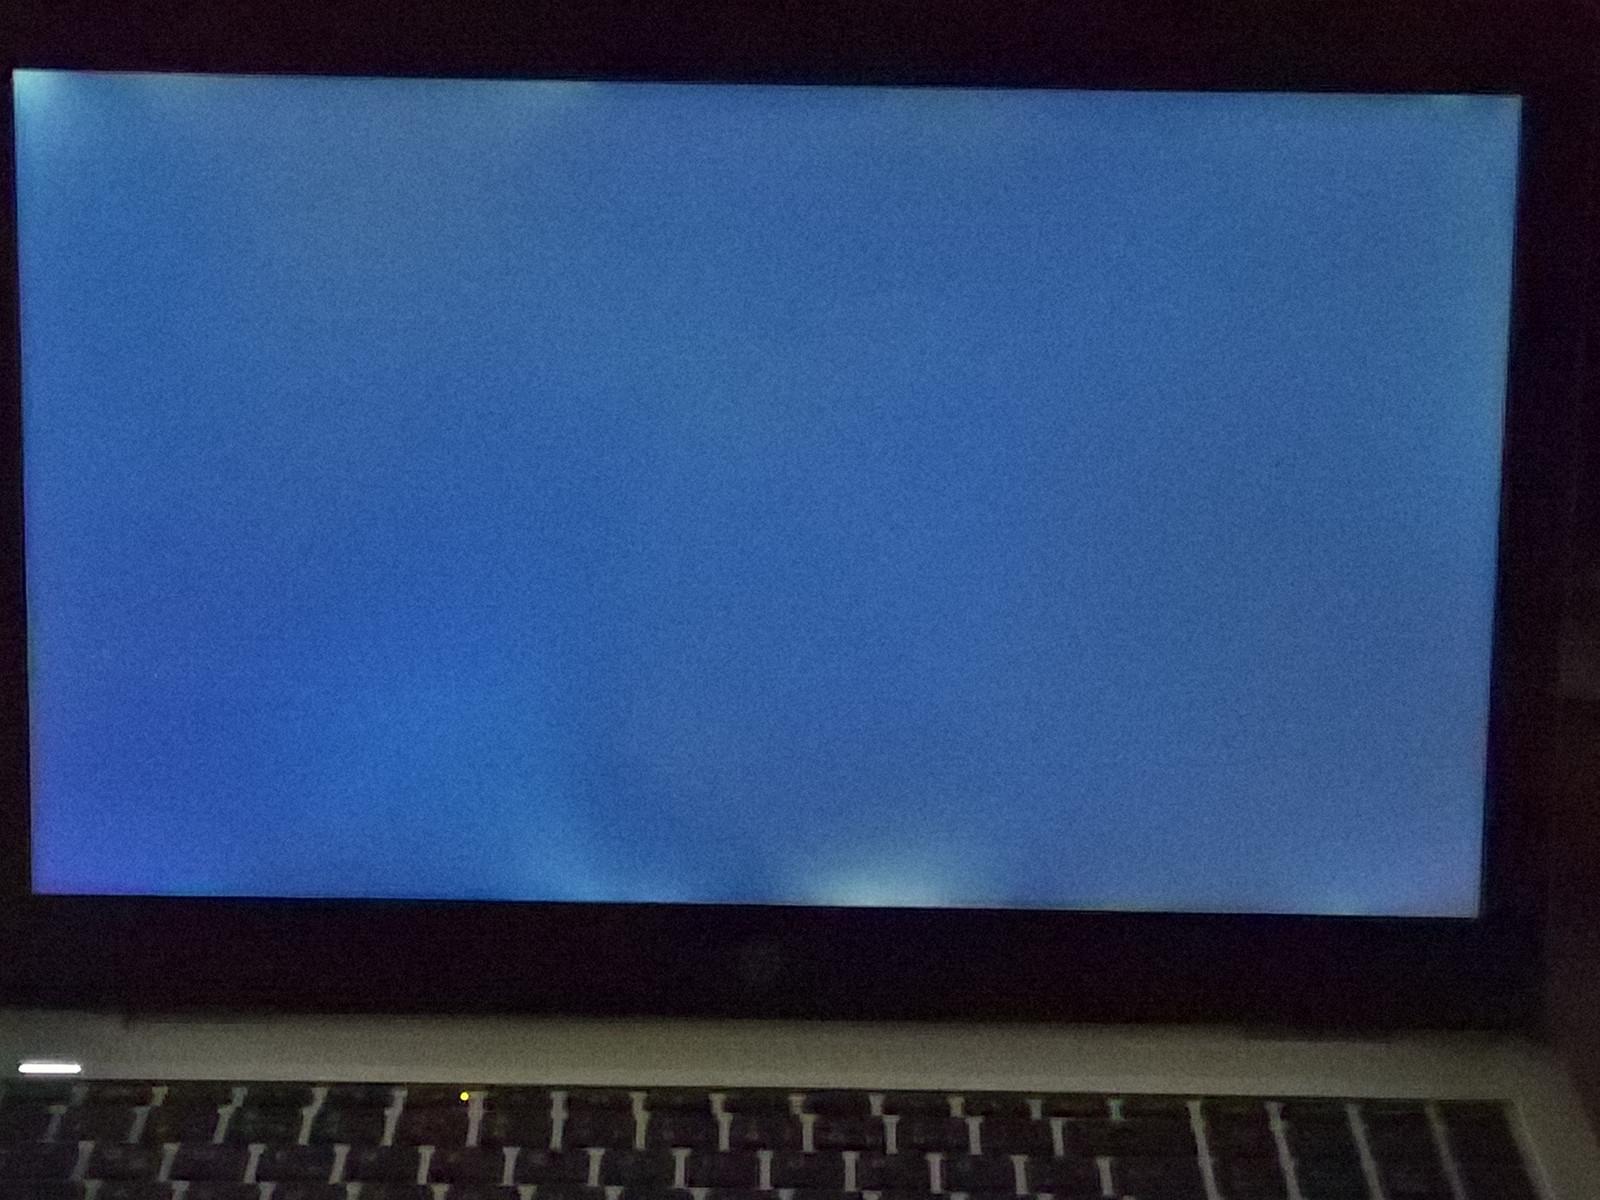 Resetting hp laptop stuck at 43 | Reset PC windows 10 stuck